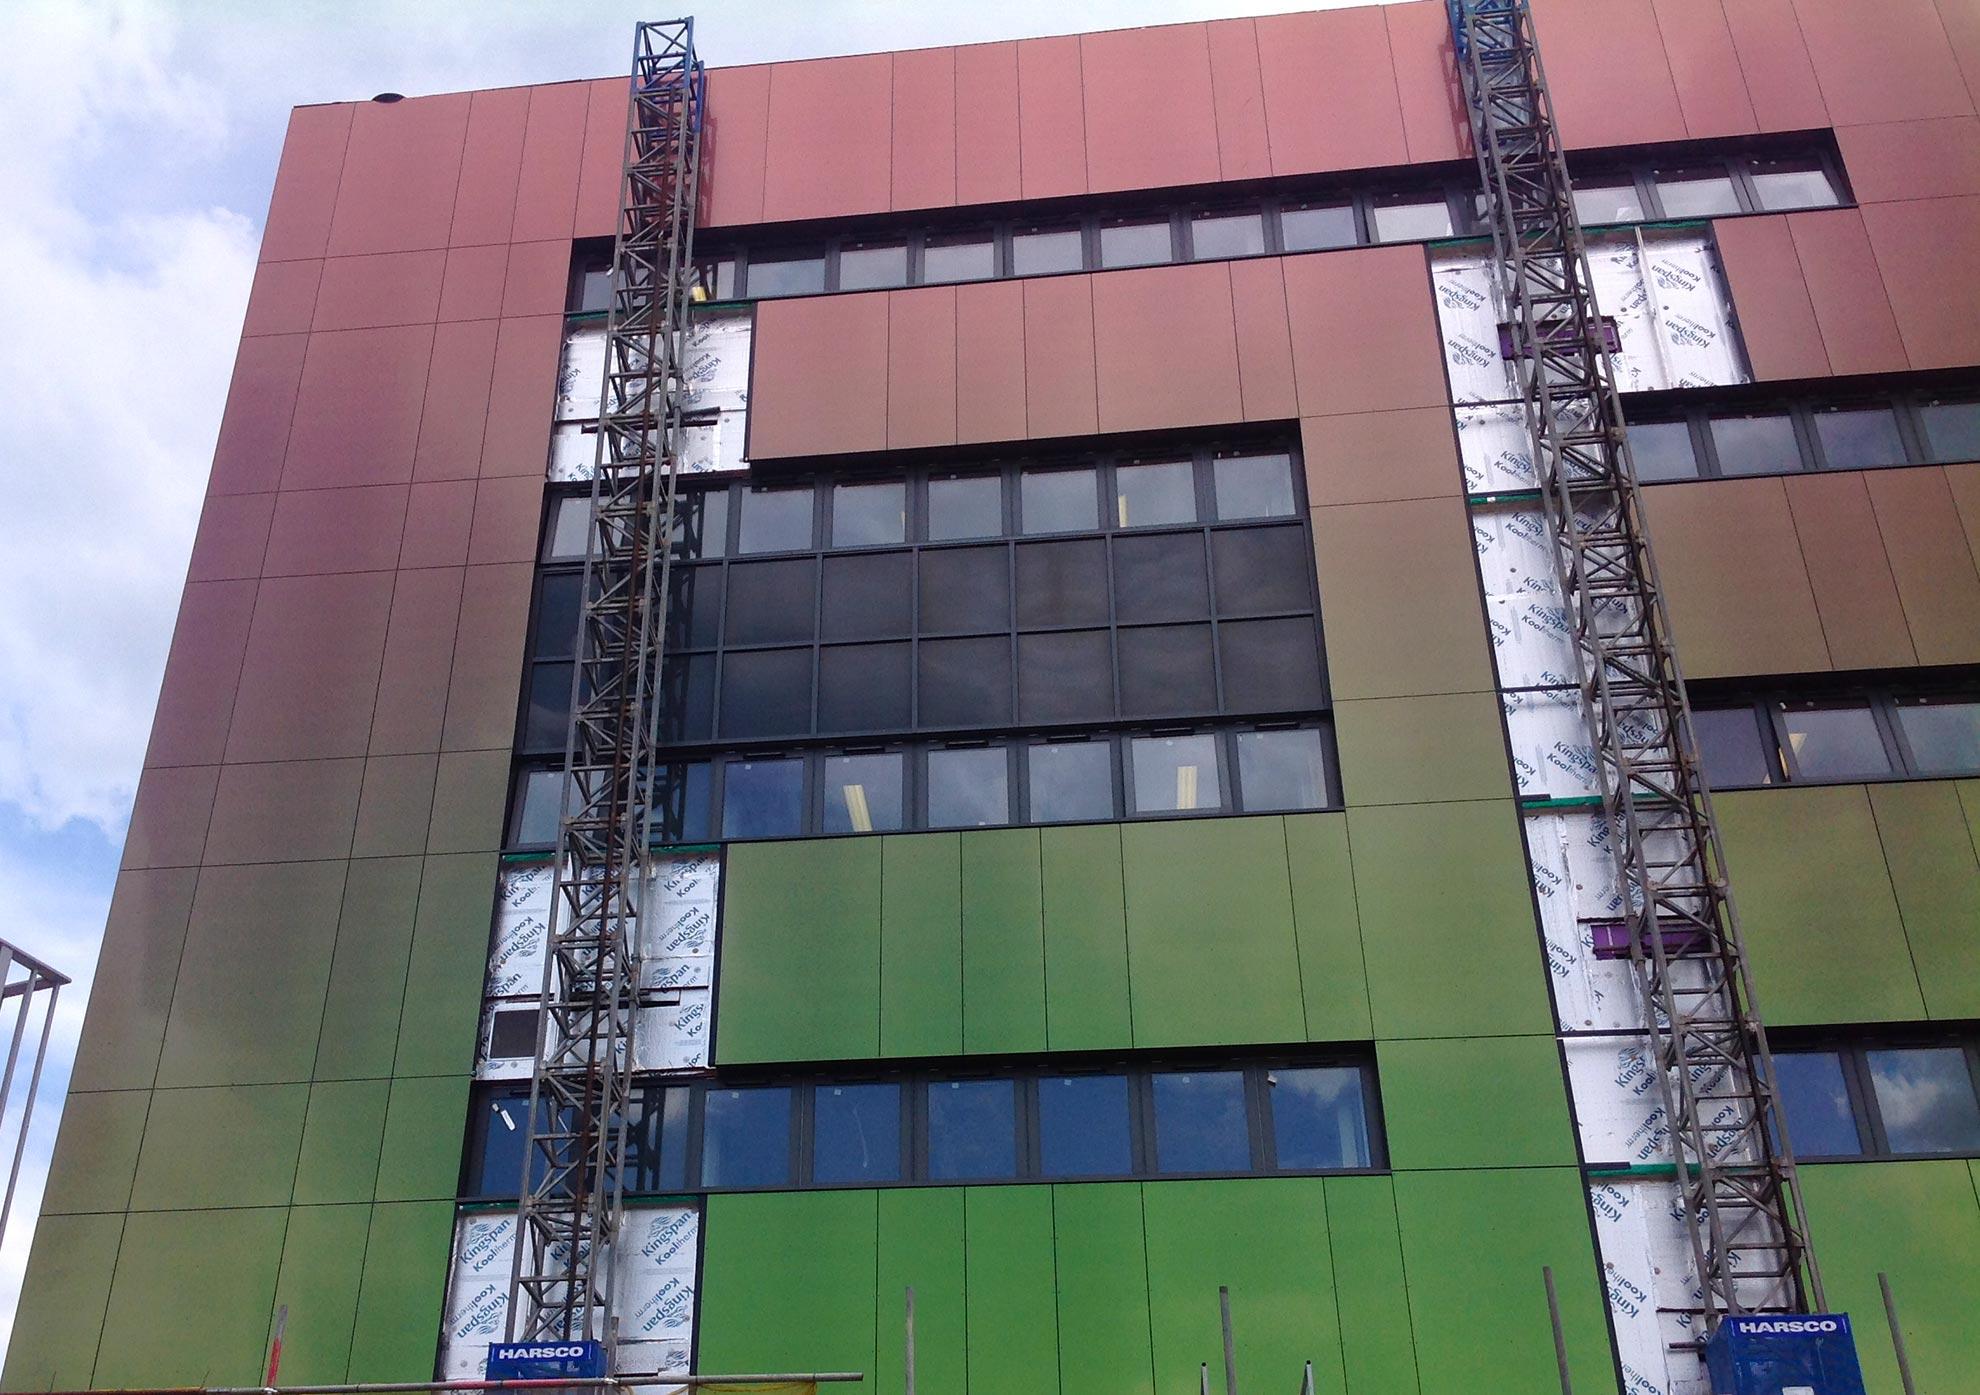 Colegio-Lowestoft.-Suffolk-UK.-larson-PE-PVdF-HOLO-RED-GREEN-1810m_01-1_1592389282.jpg